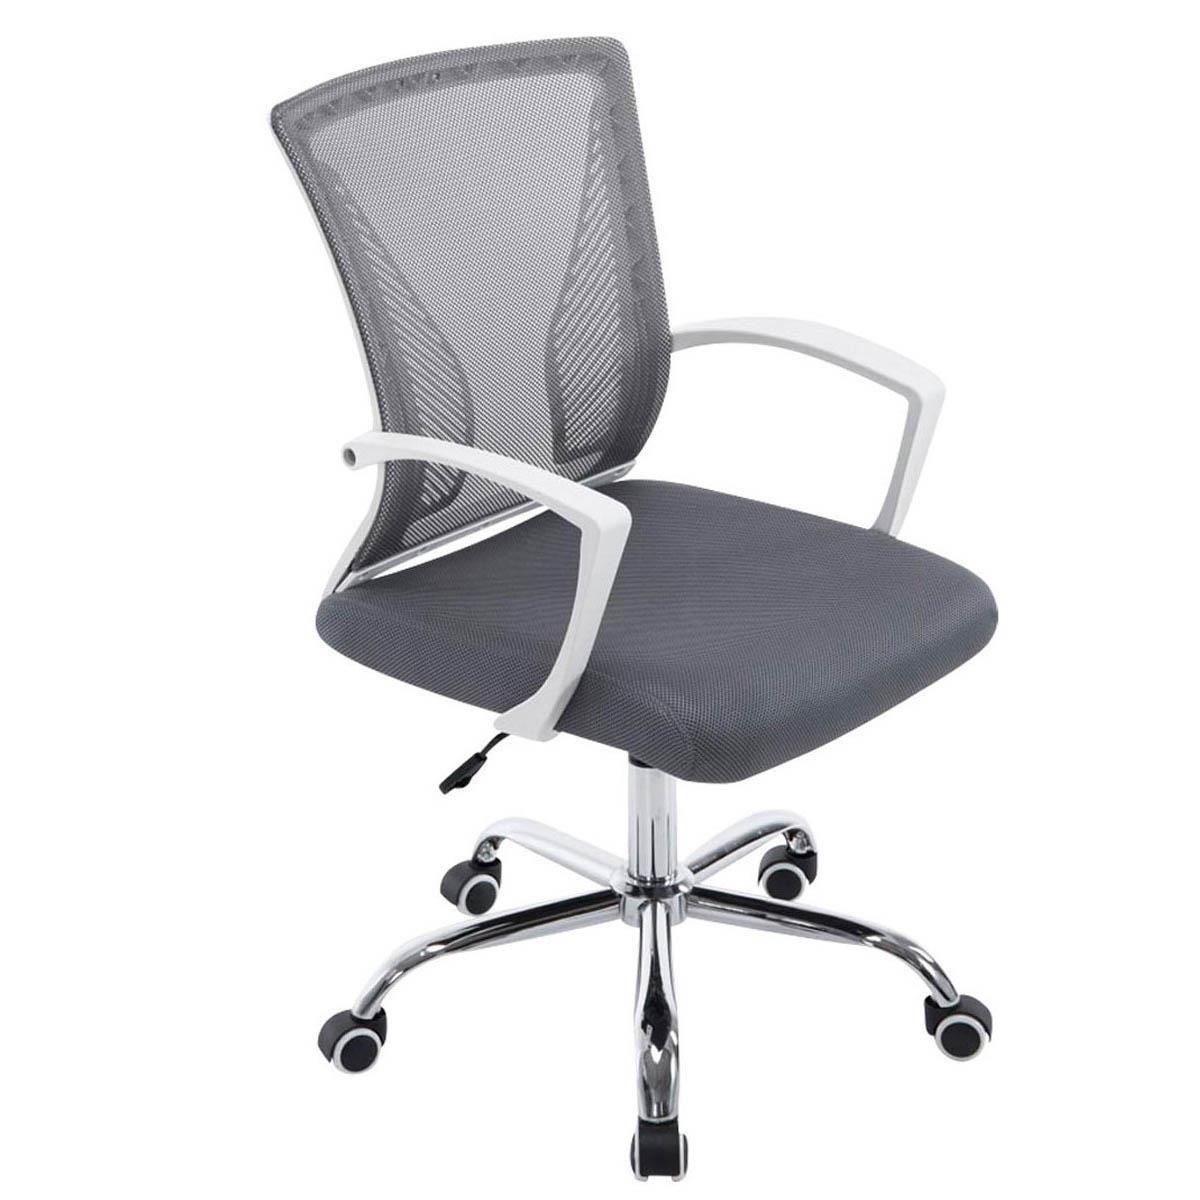 Wood swivel desk chair laquered finish warms amp padded seat ebay - Silla De Oficina Cuba Estructura Met Lica En Malla Transpirable Color Gris